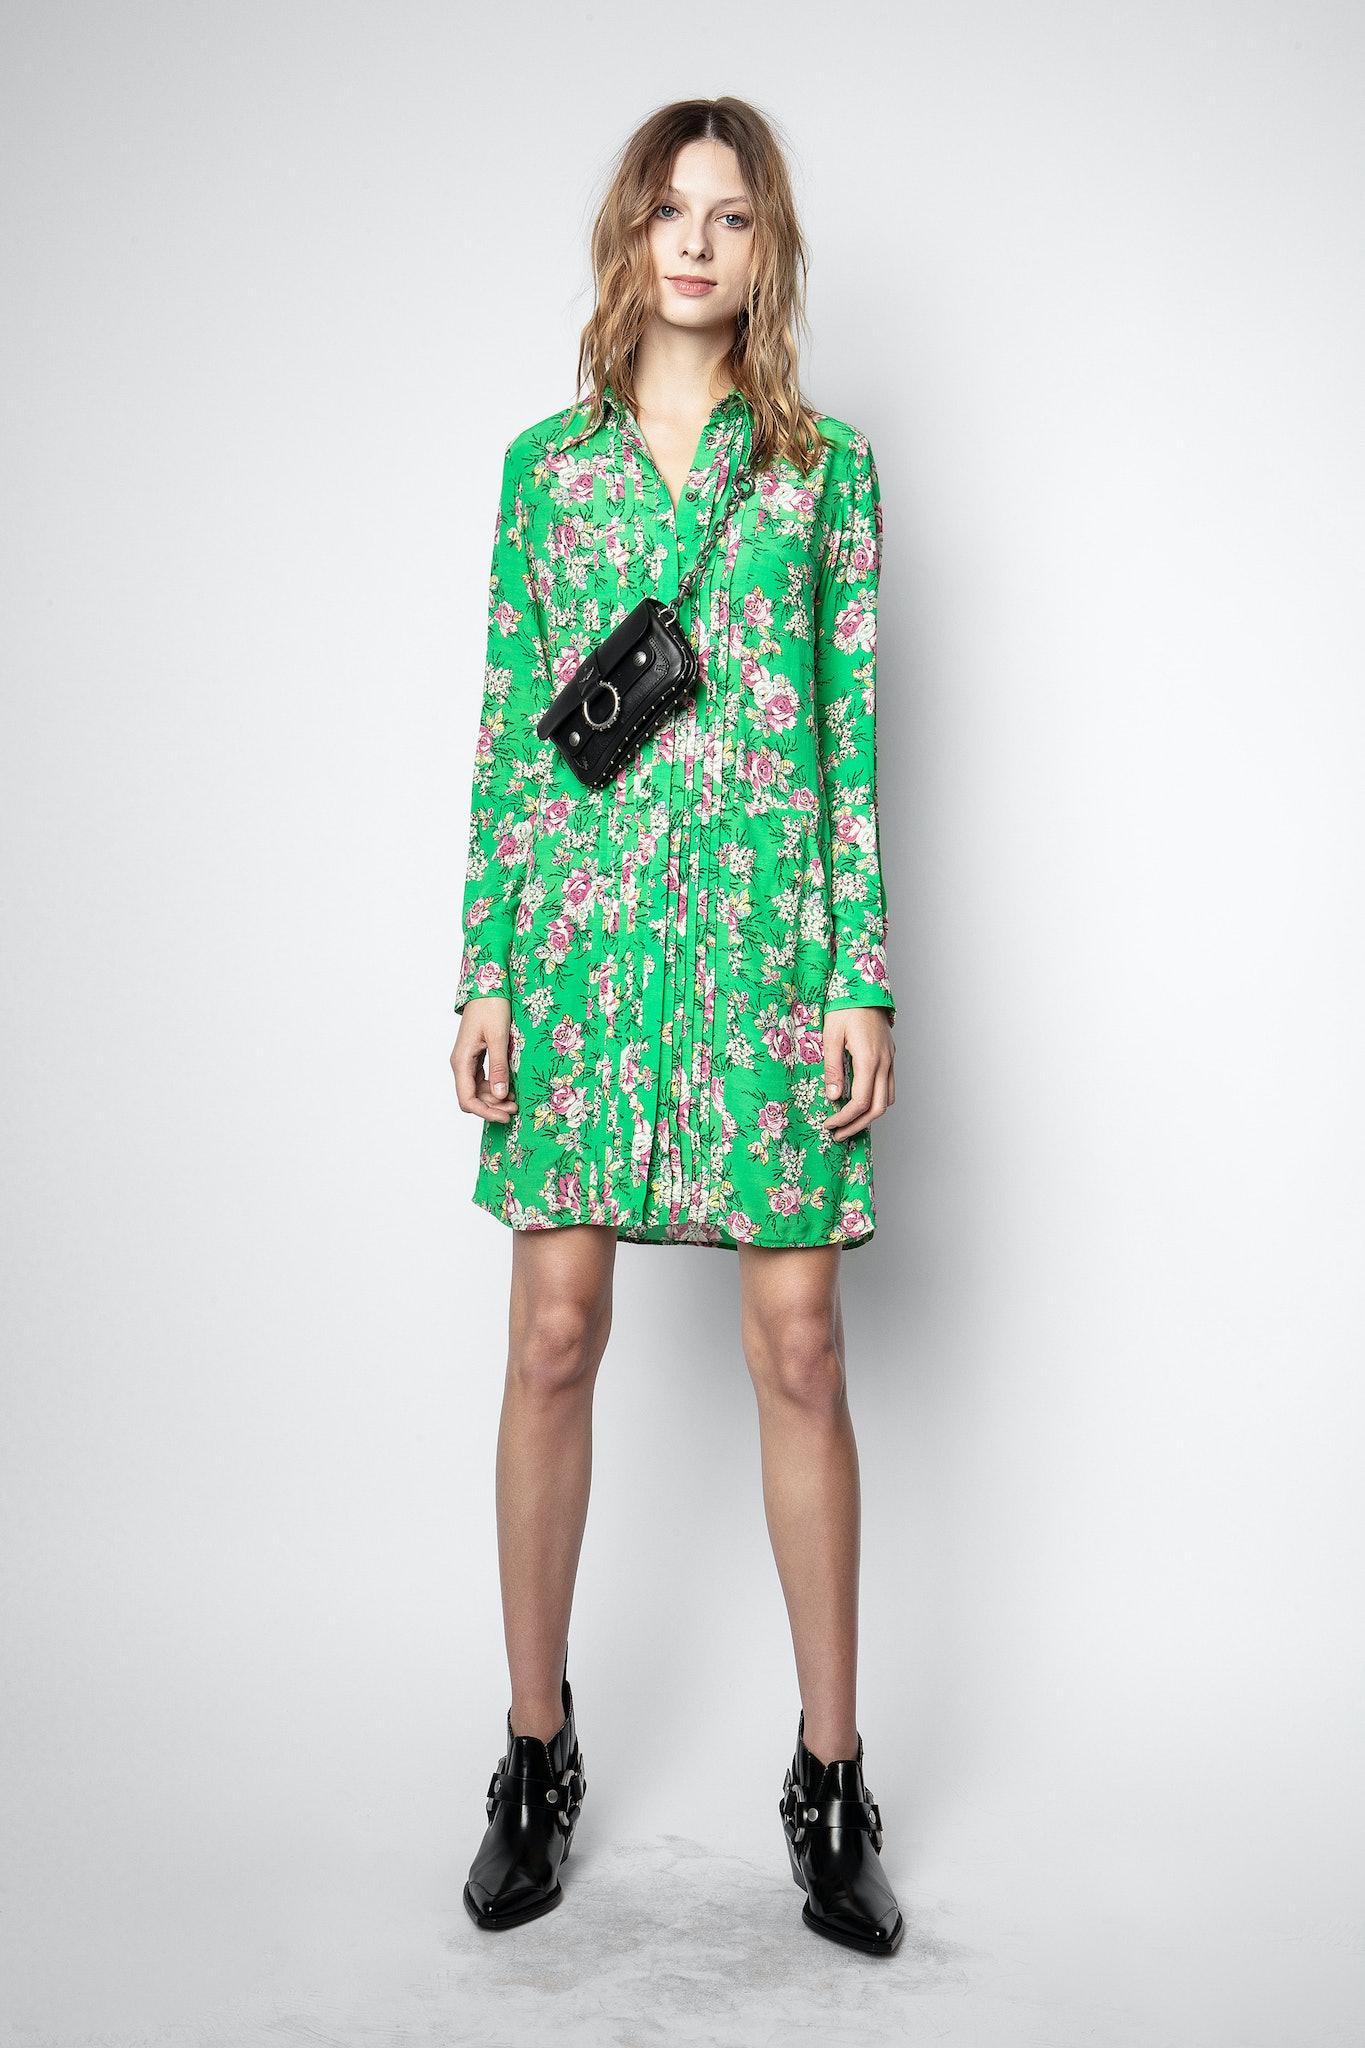 Rougi Print Roses Dress